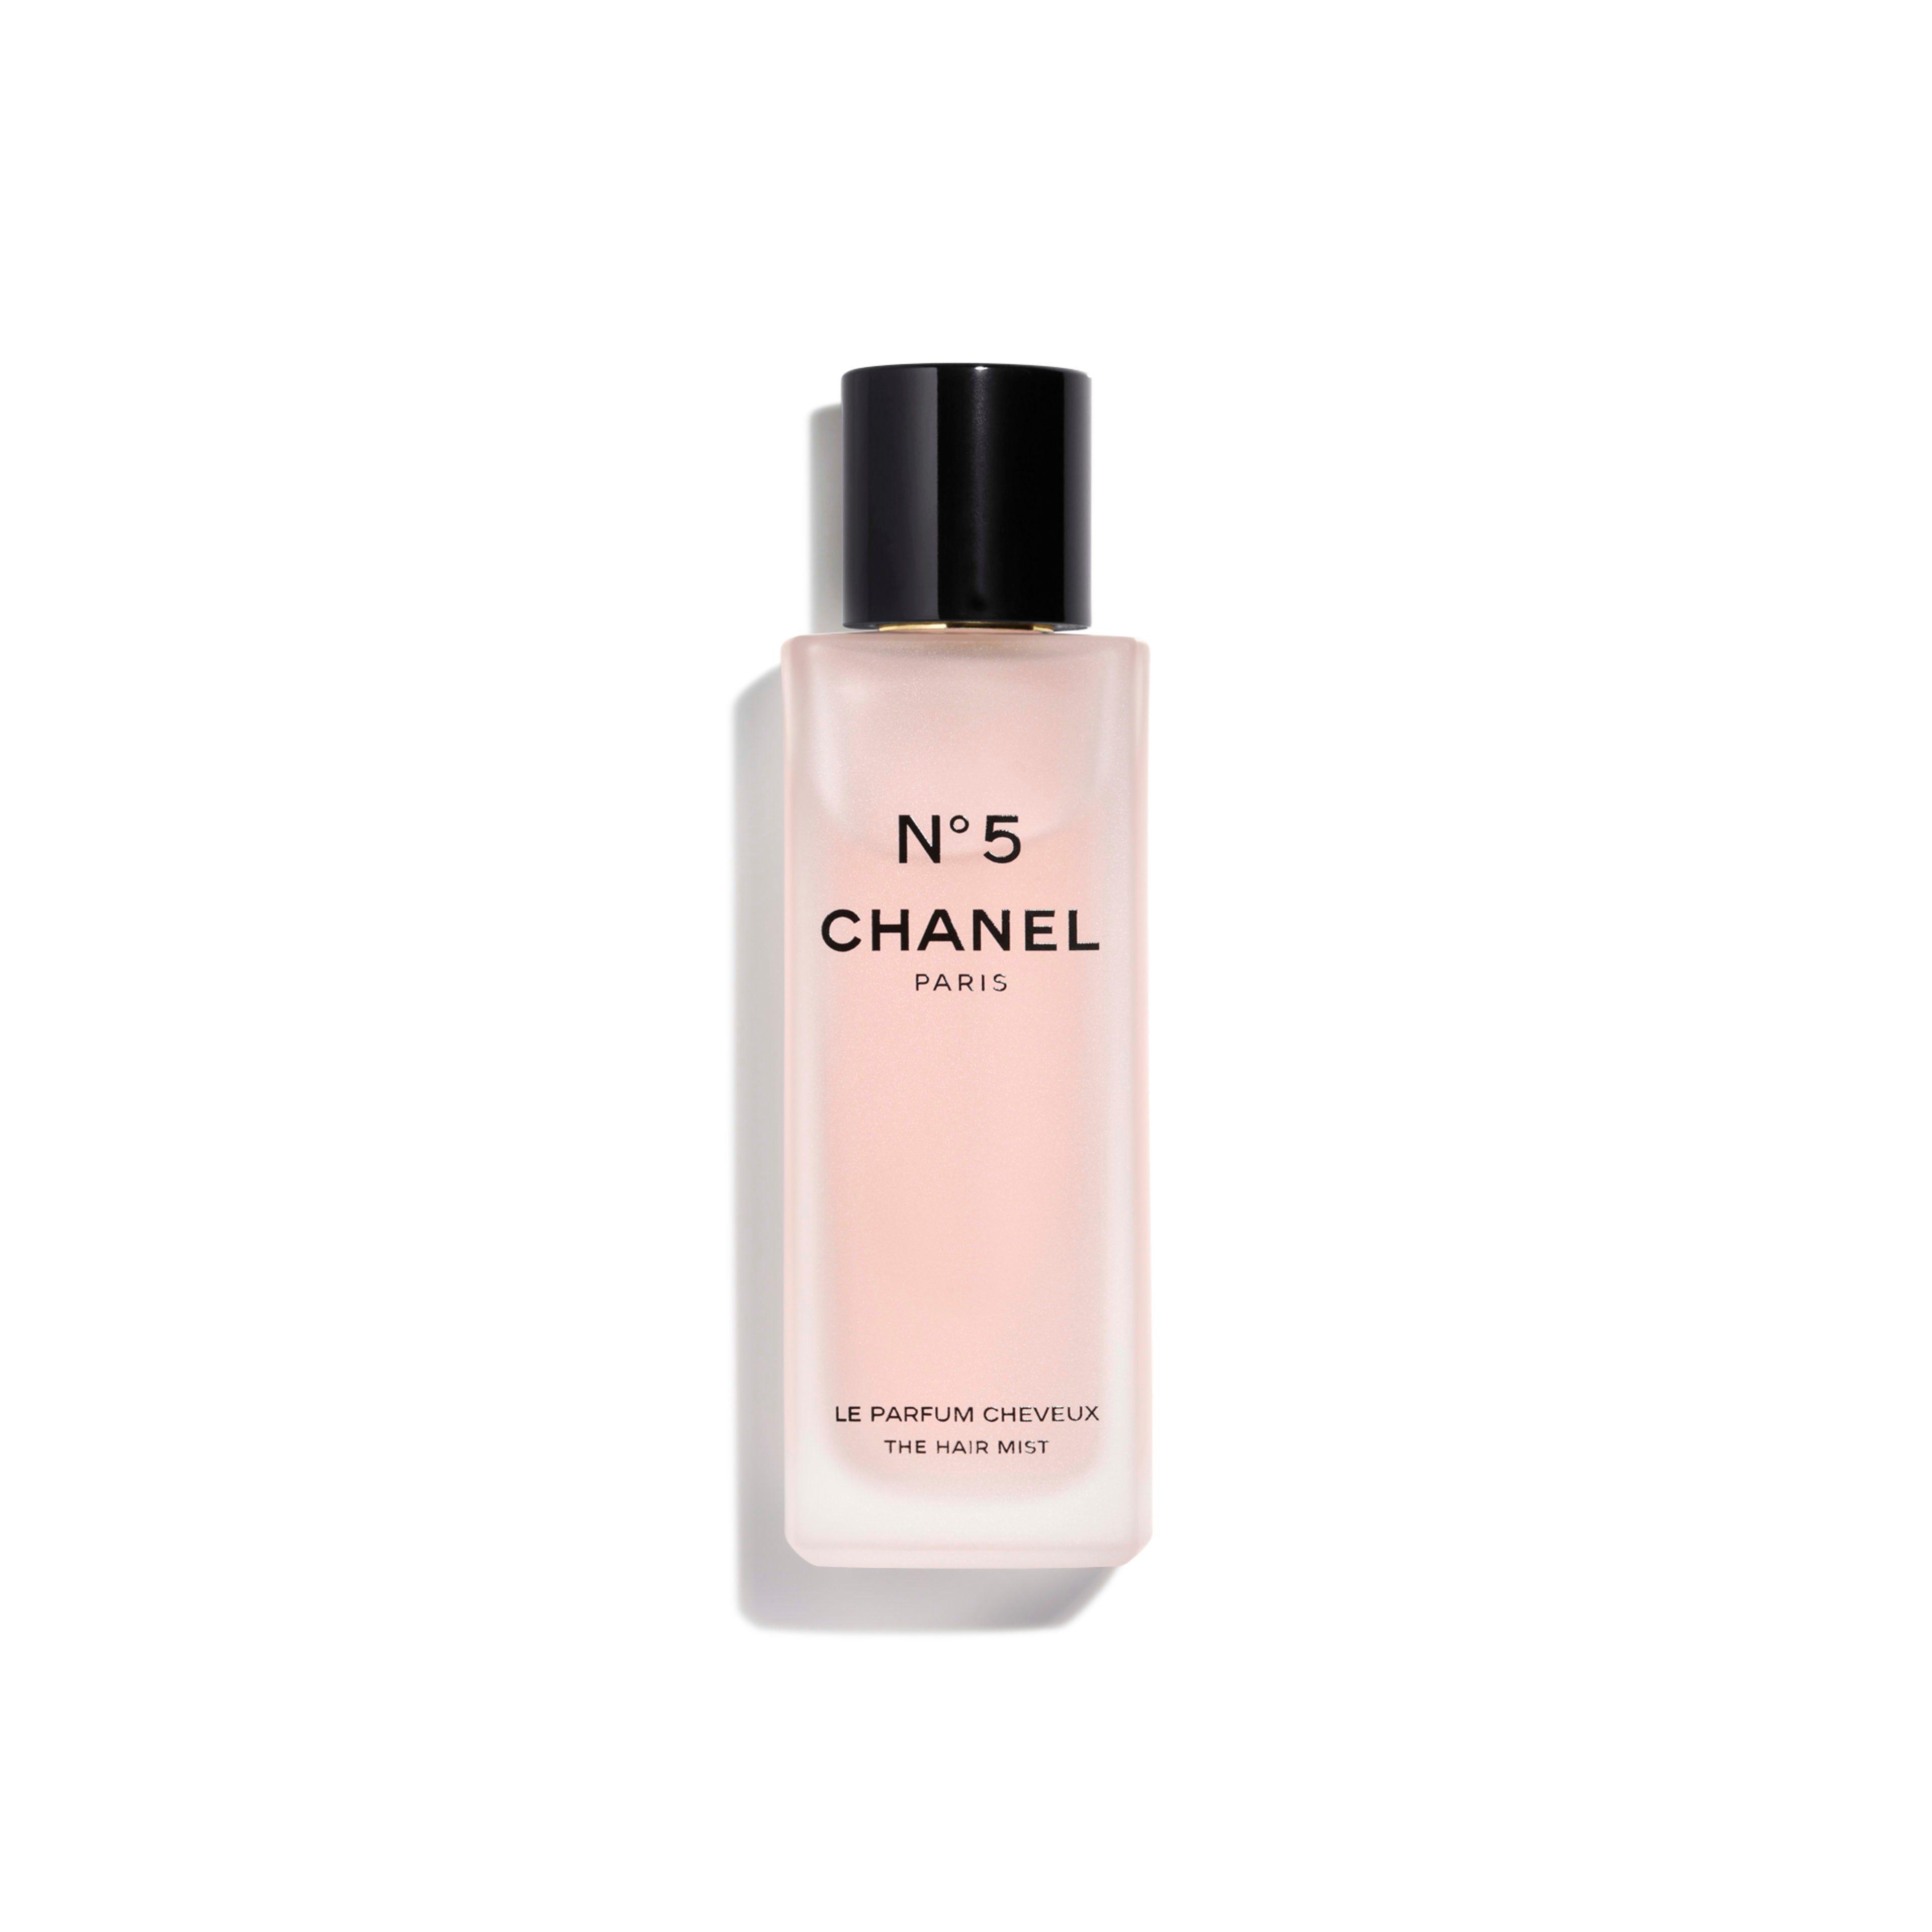 Never Spray Perfume In Your Hair